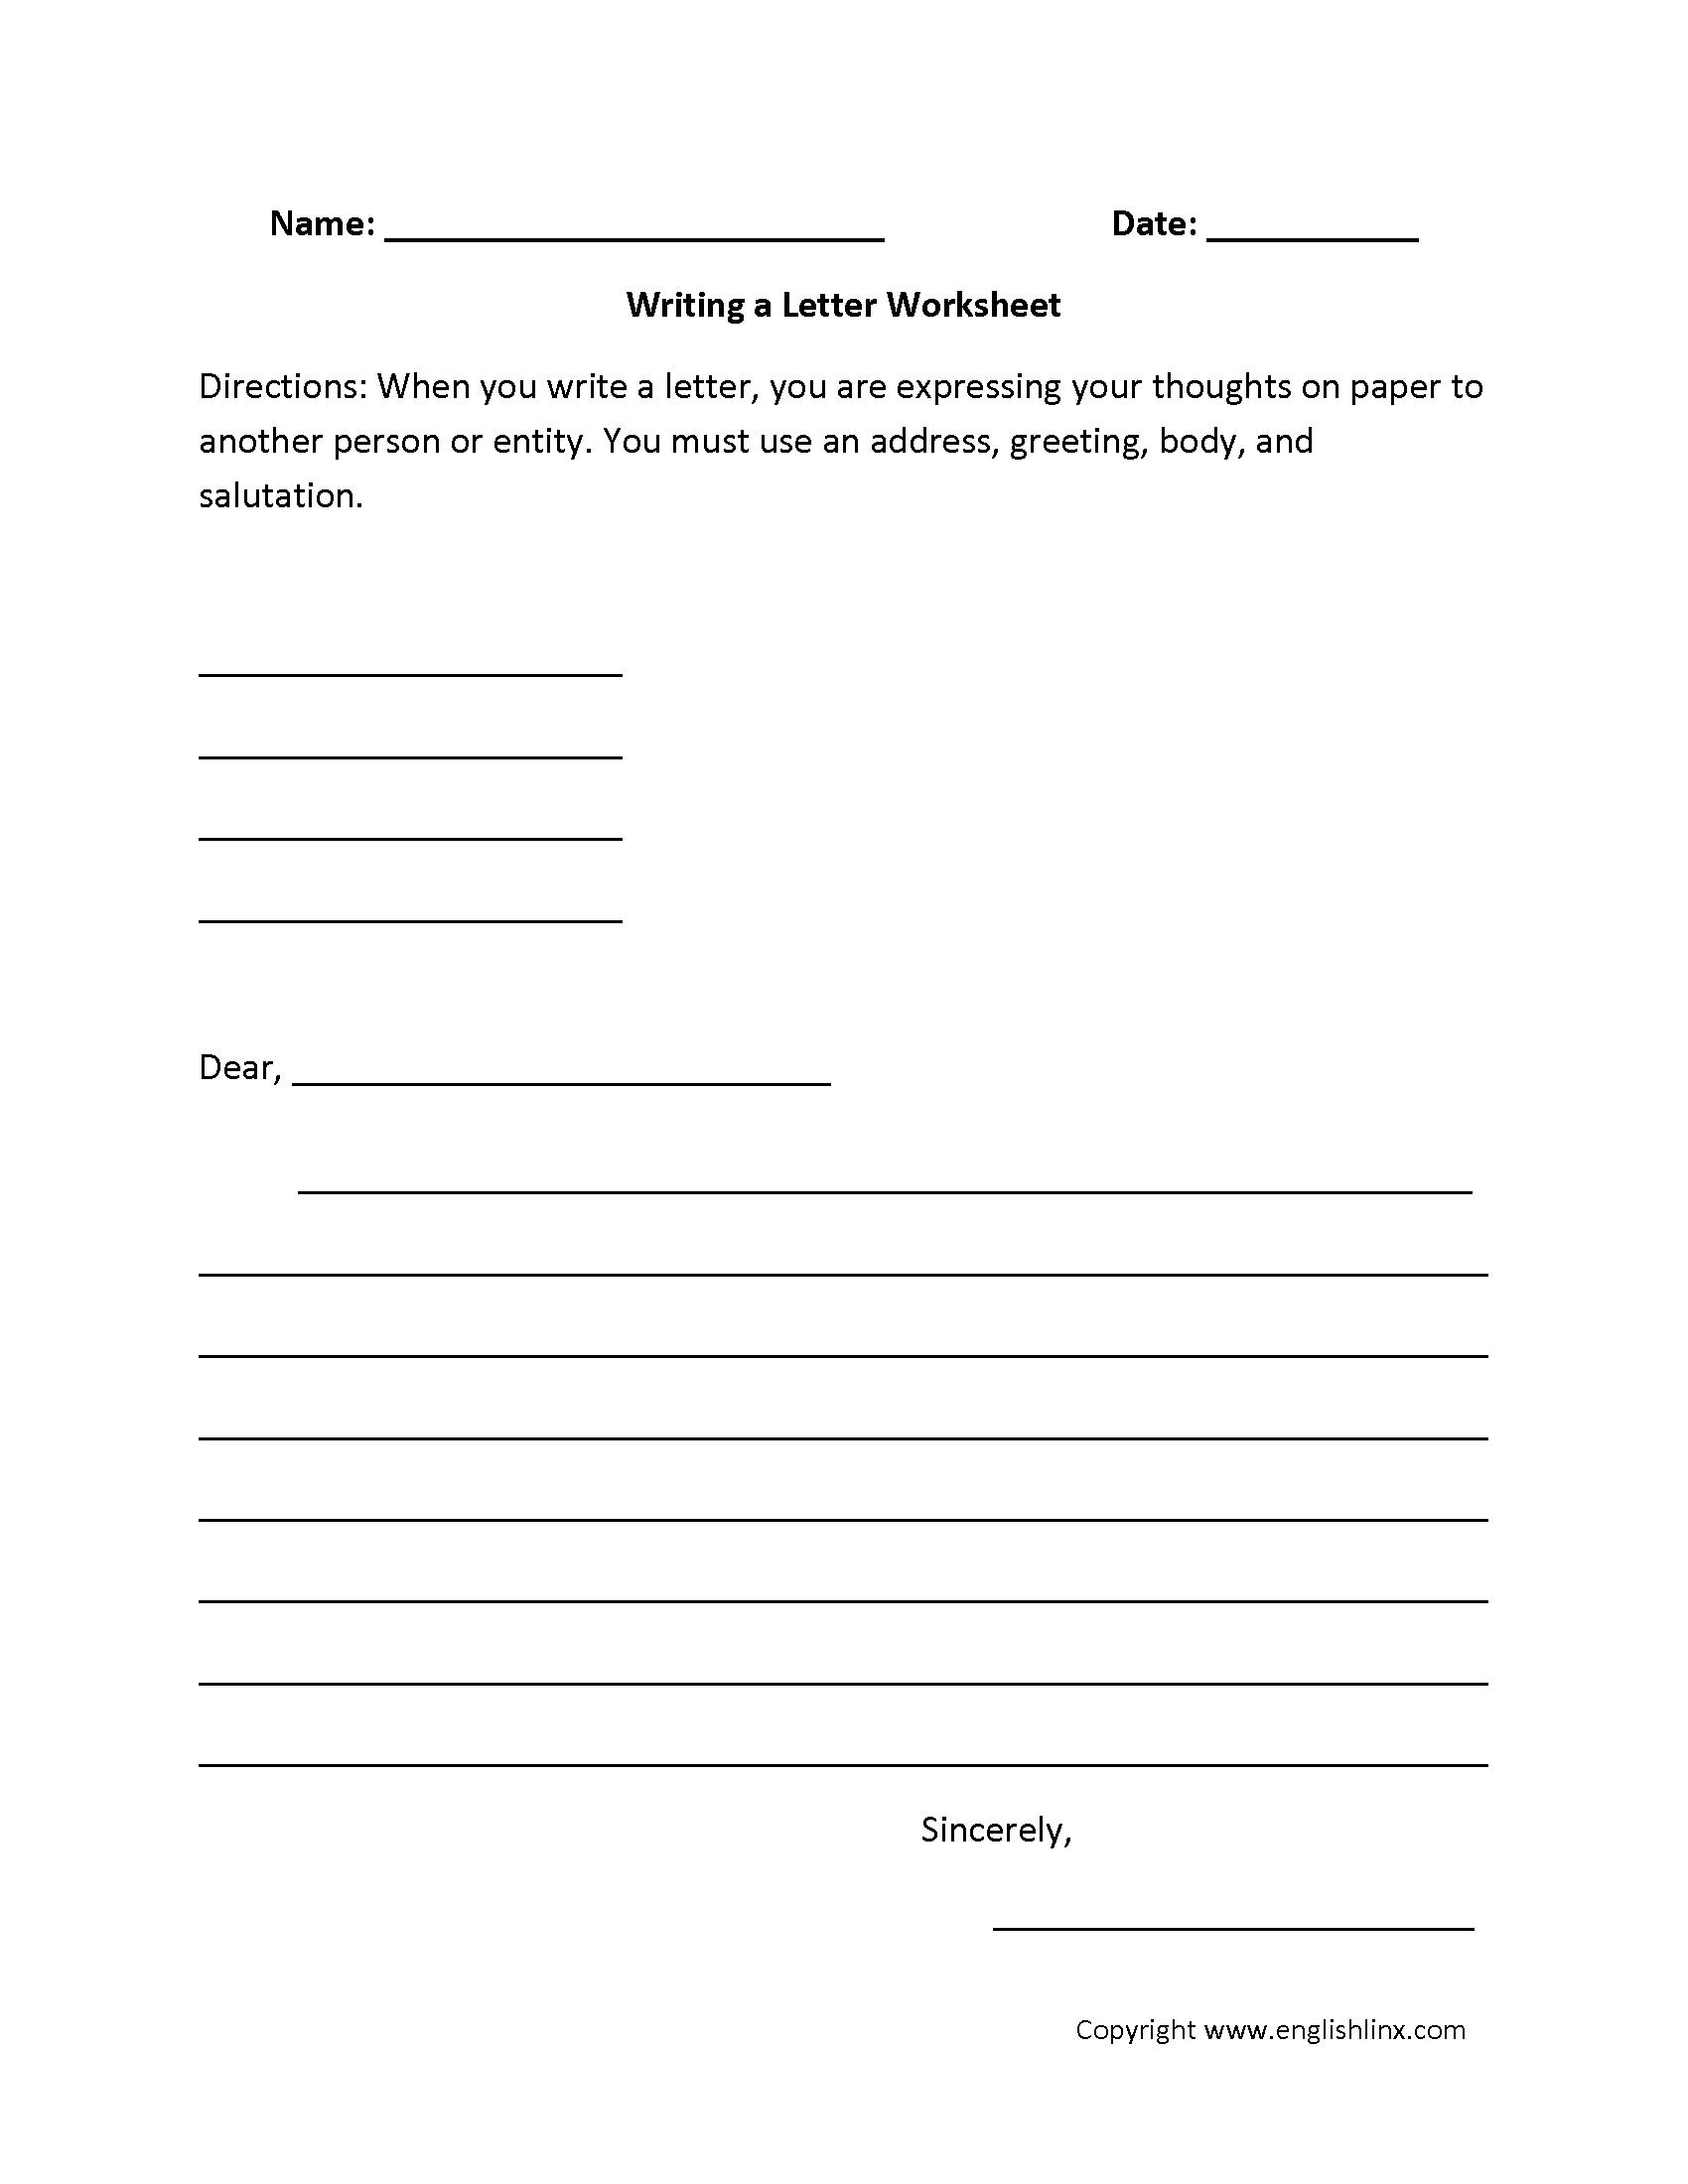 Englishlinx | Writing Worksheets | Free Printable Second Grade Writing Worksheets